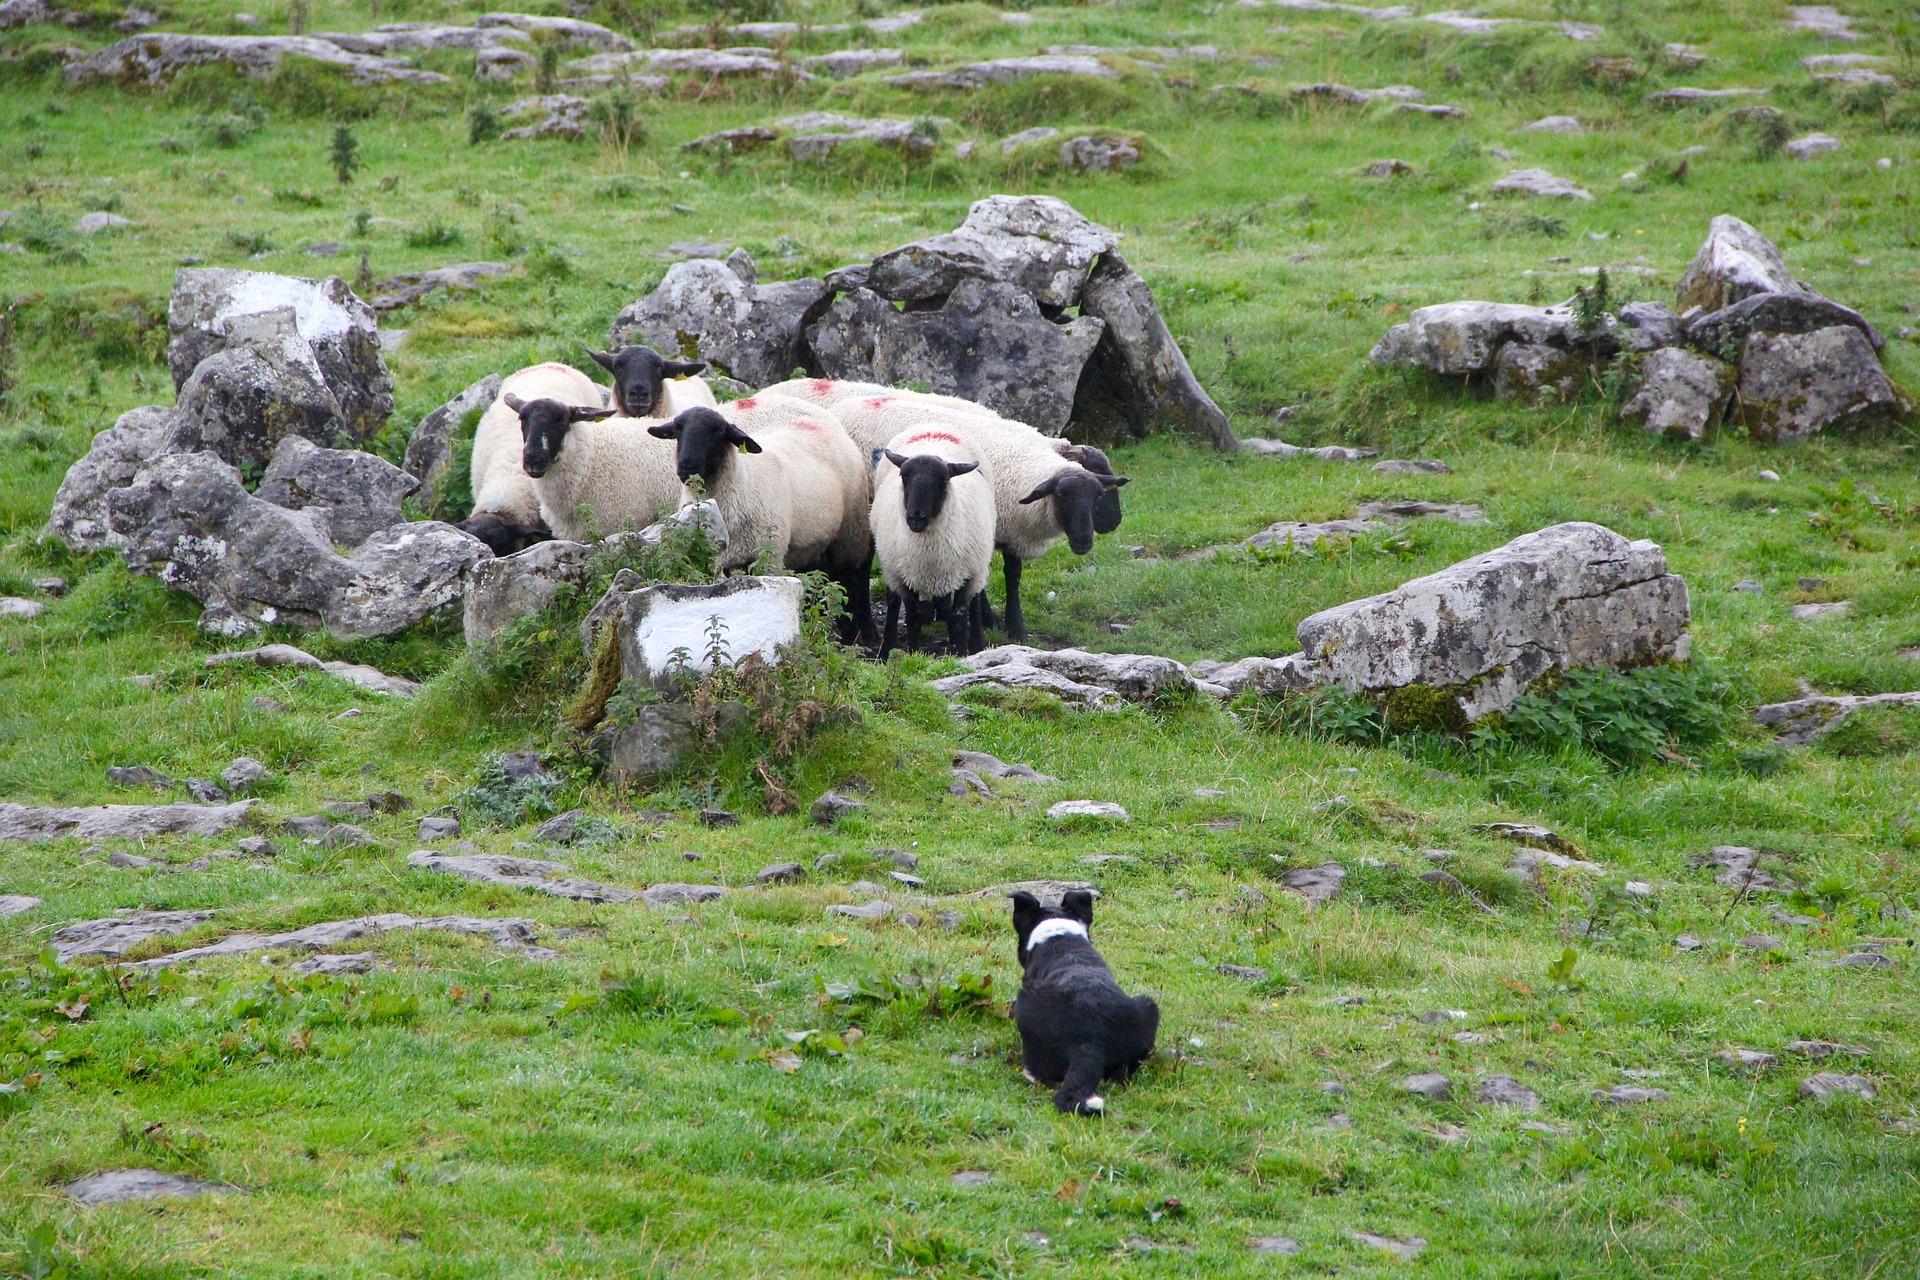 sheepdog-981878_1920.jpg